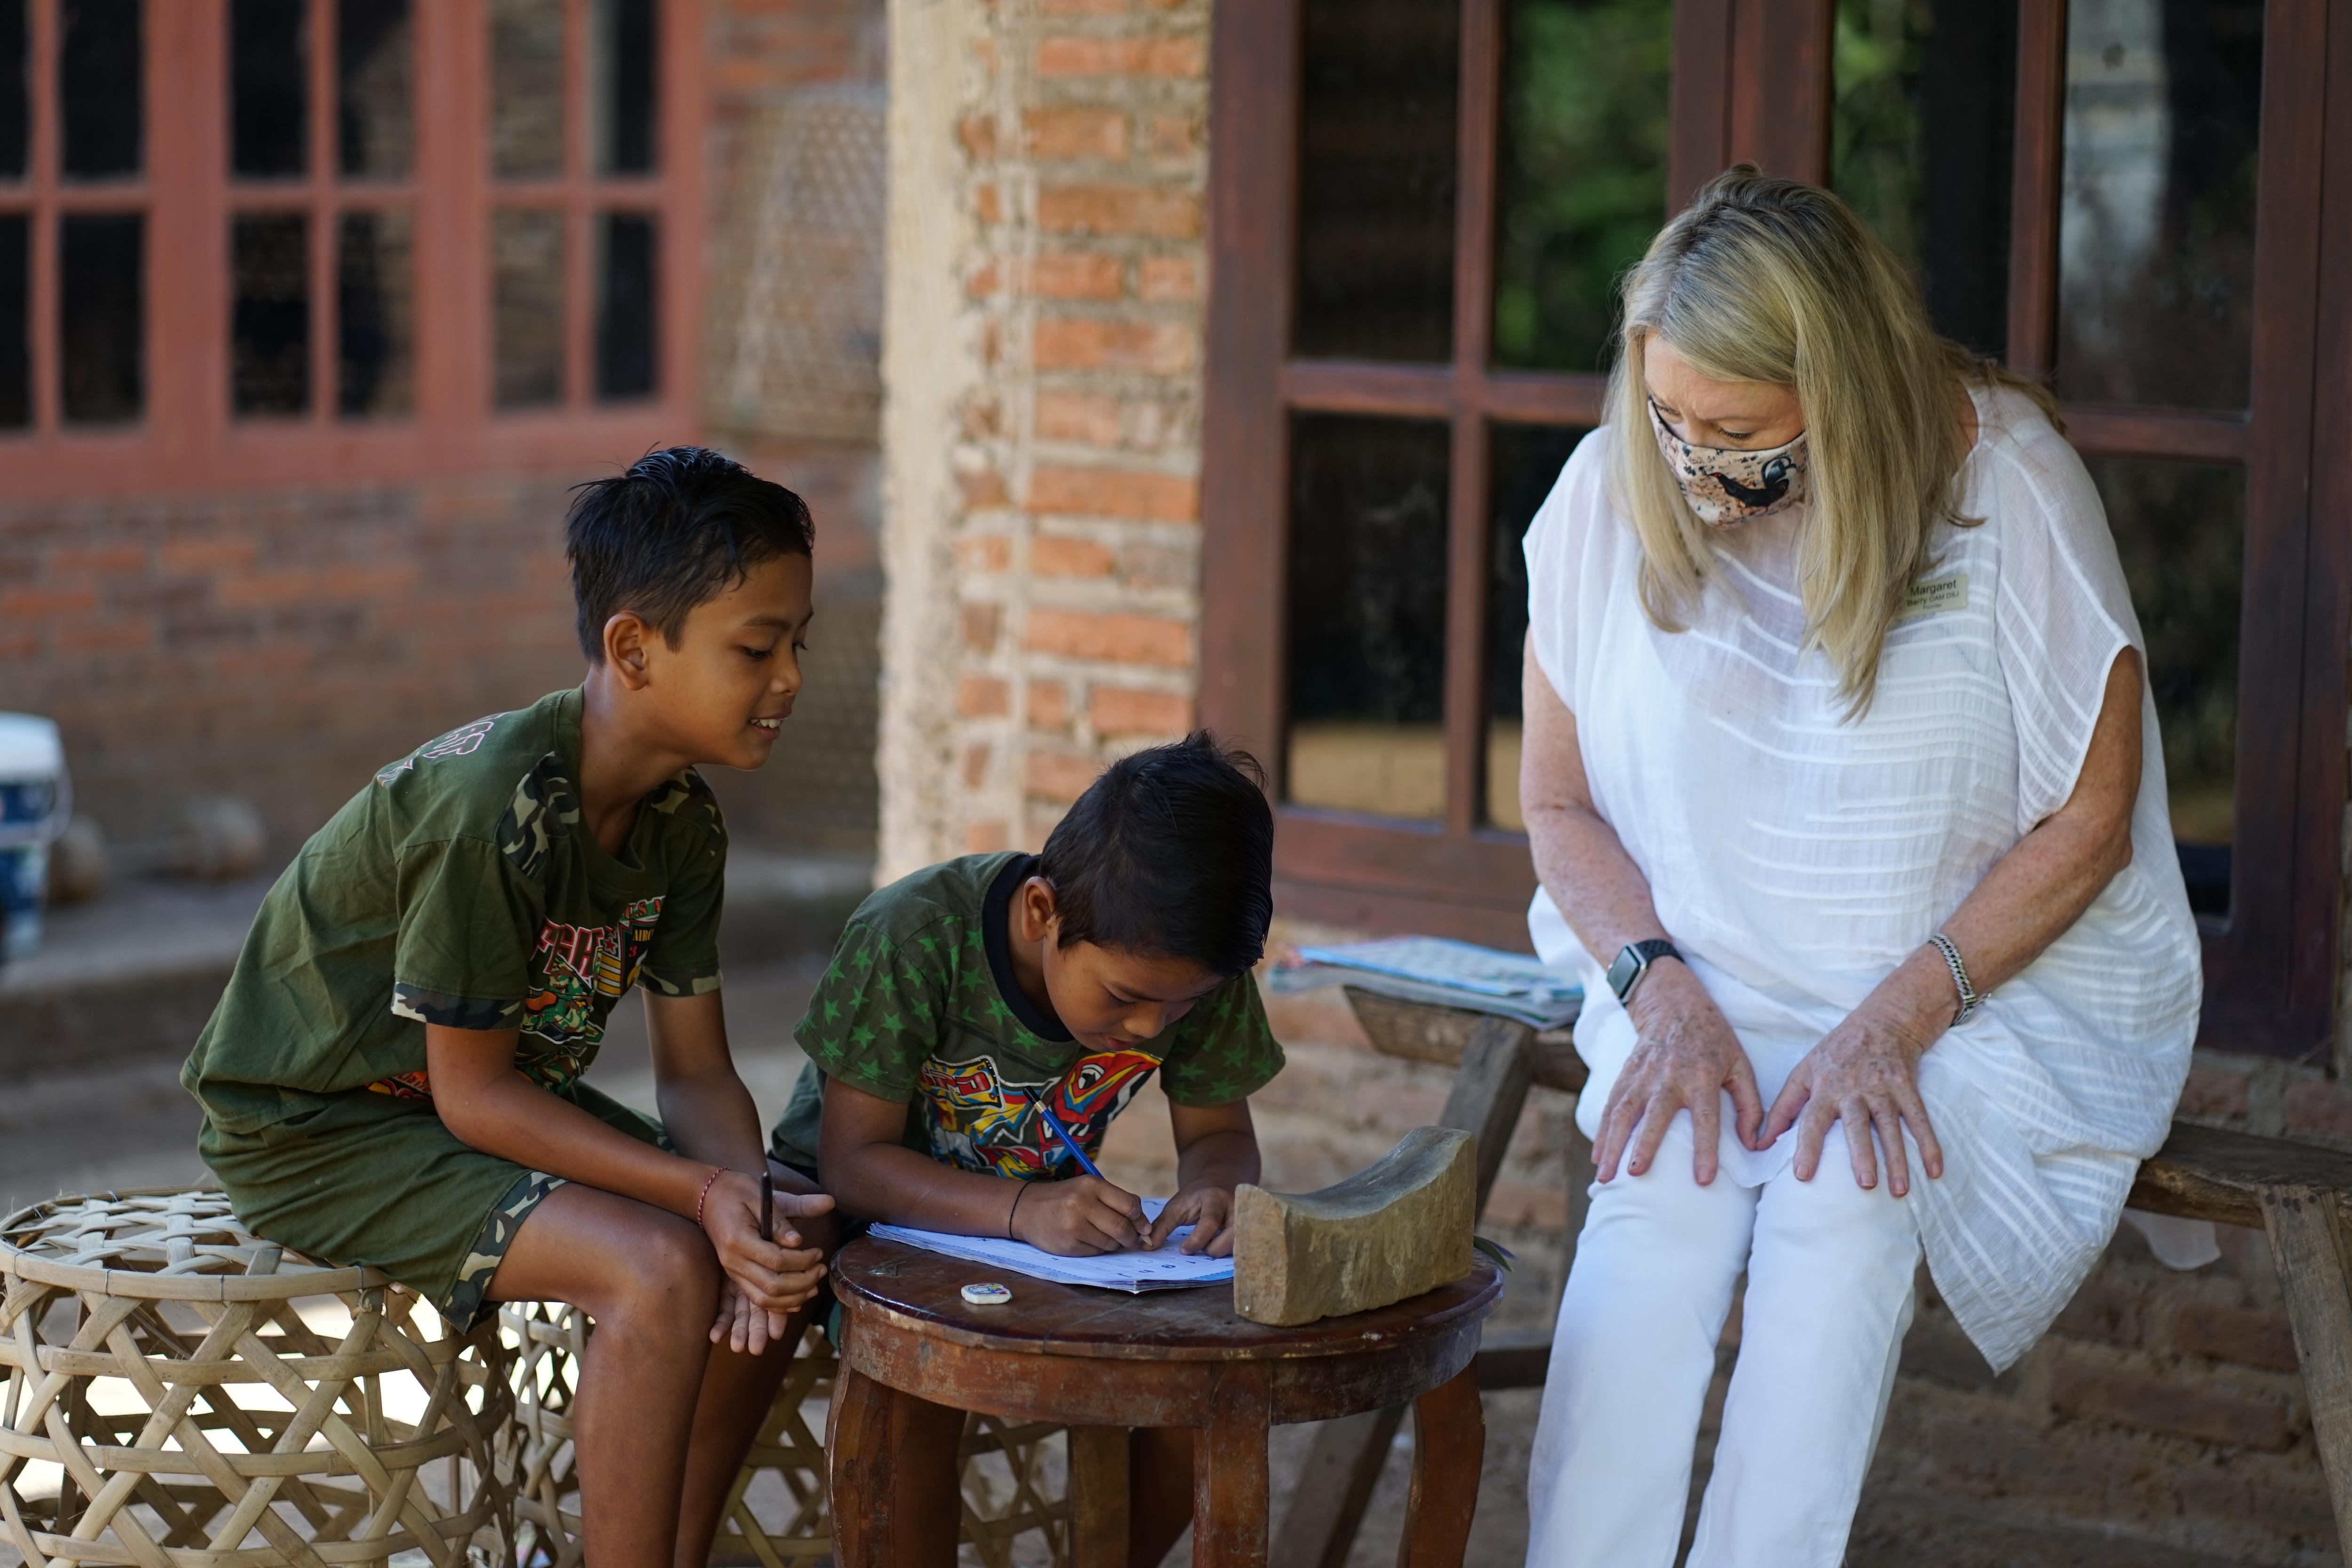 Wanita Australia Margaret Barry menjalankan Bali Children's Foundation.